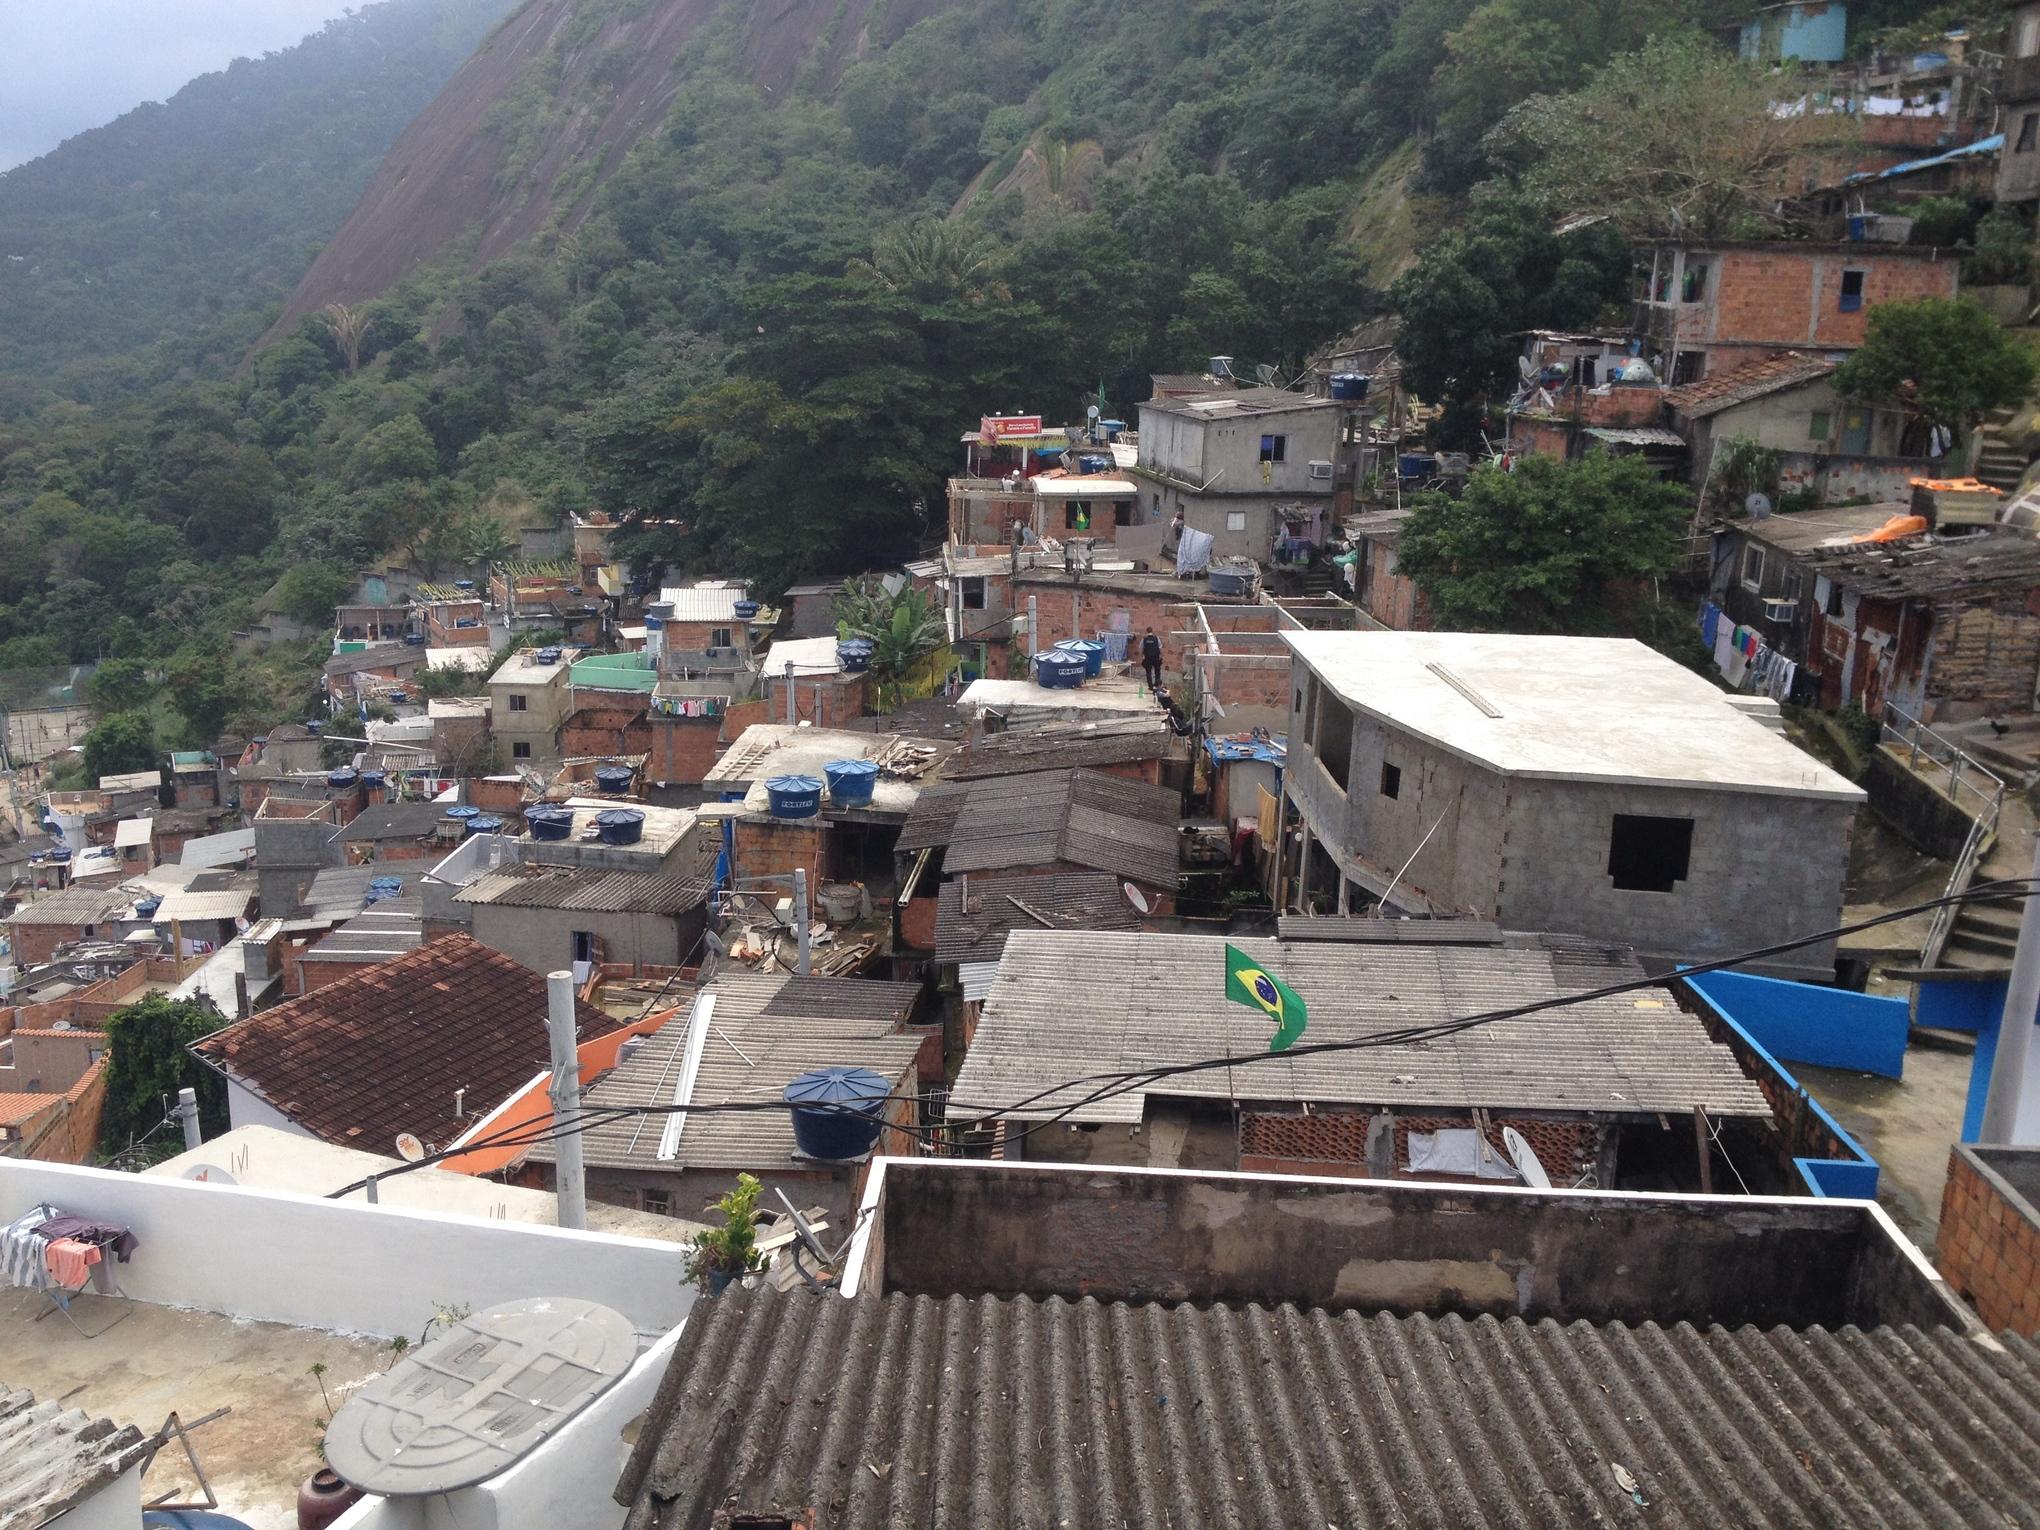 Favela_Santa_Marta_large